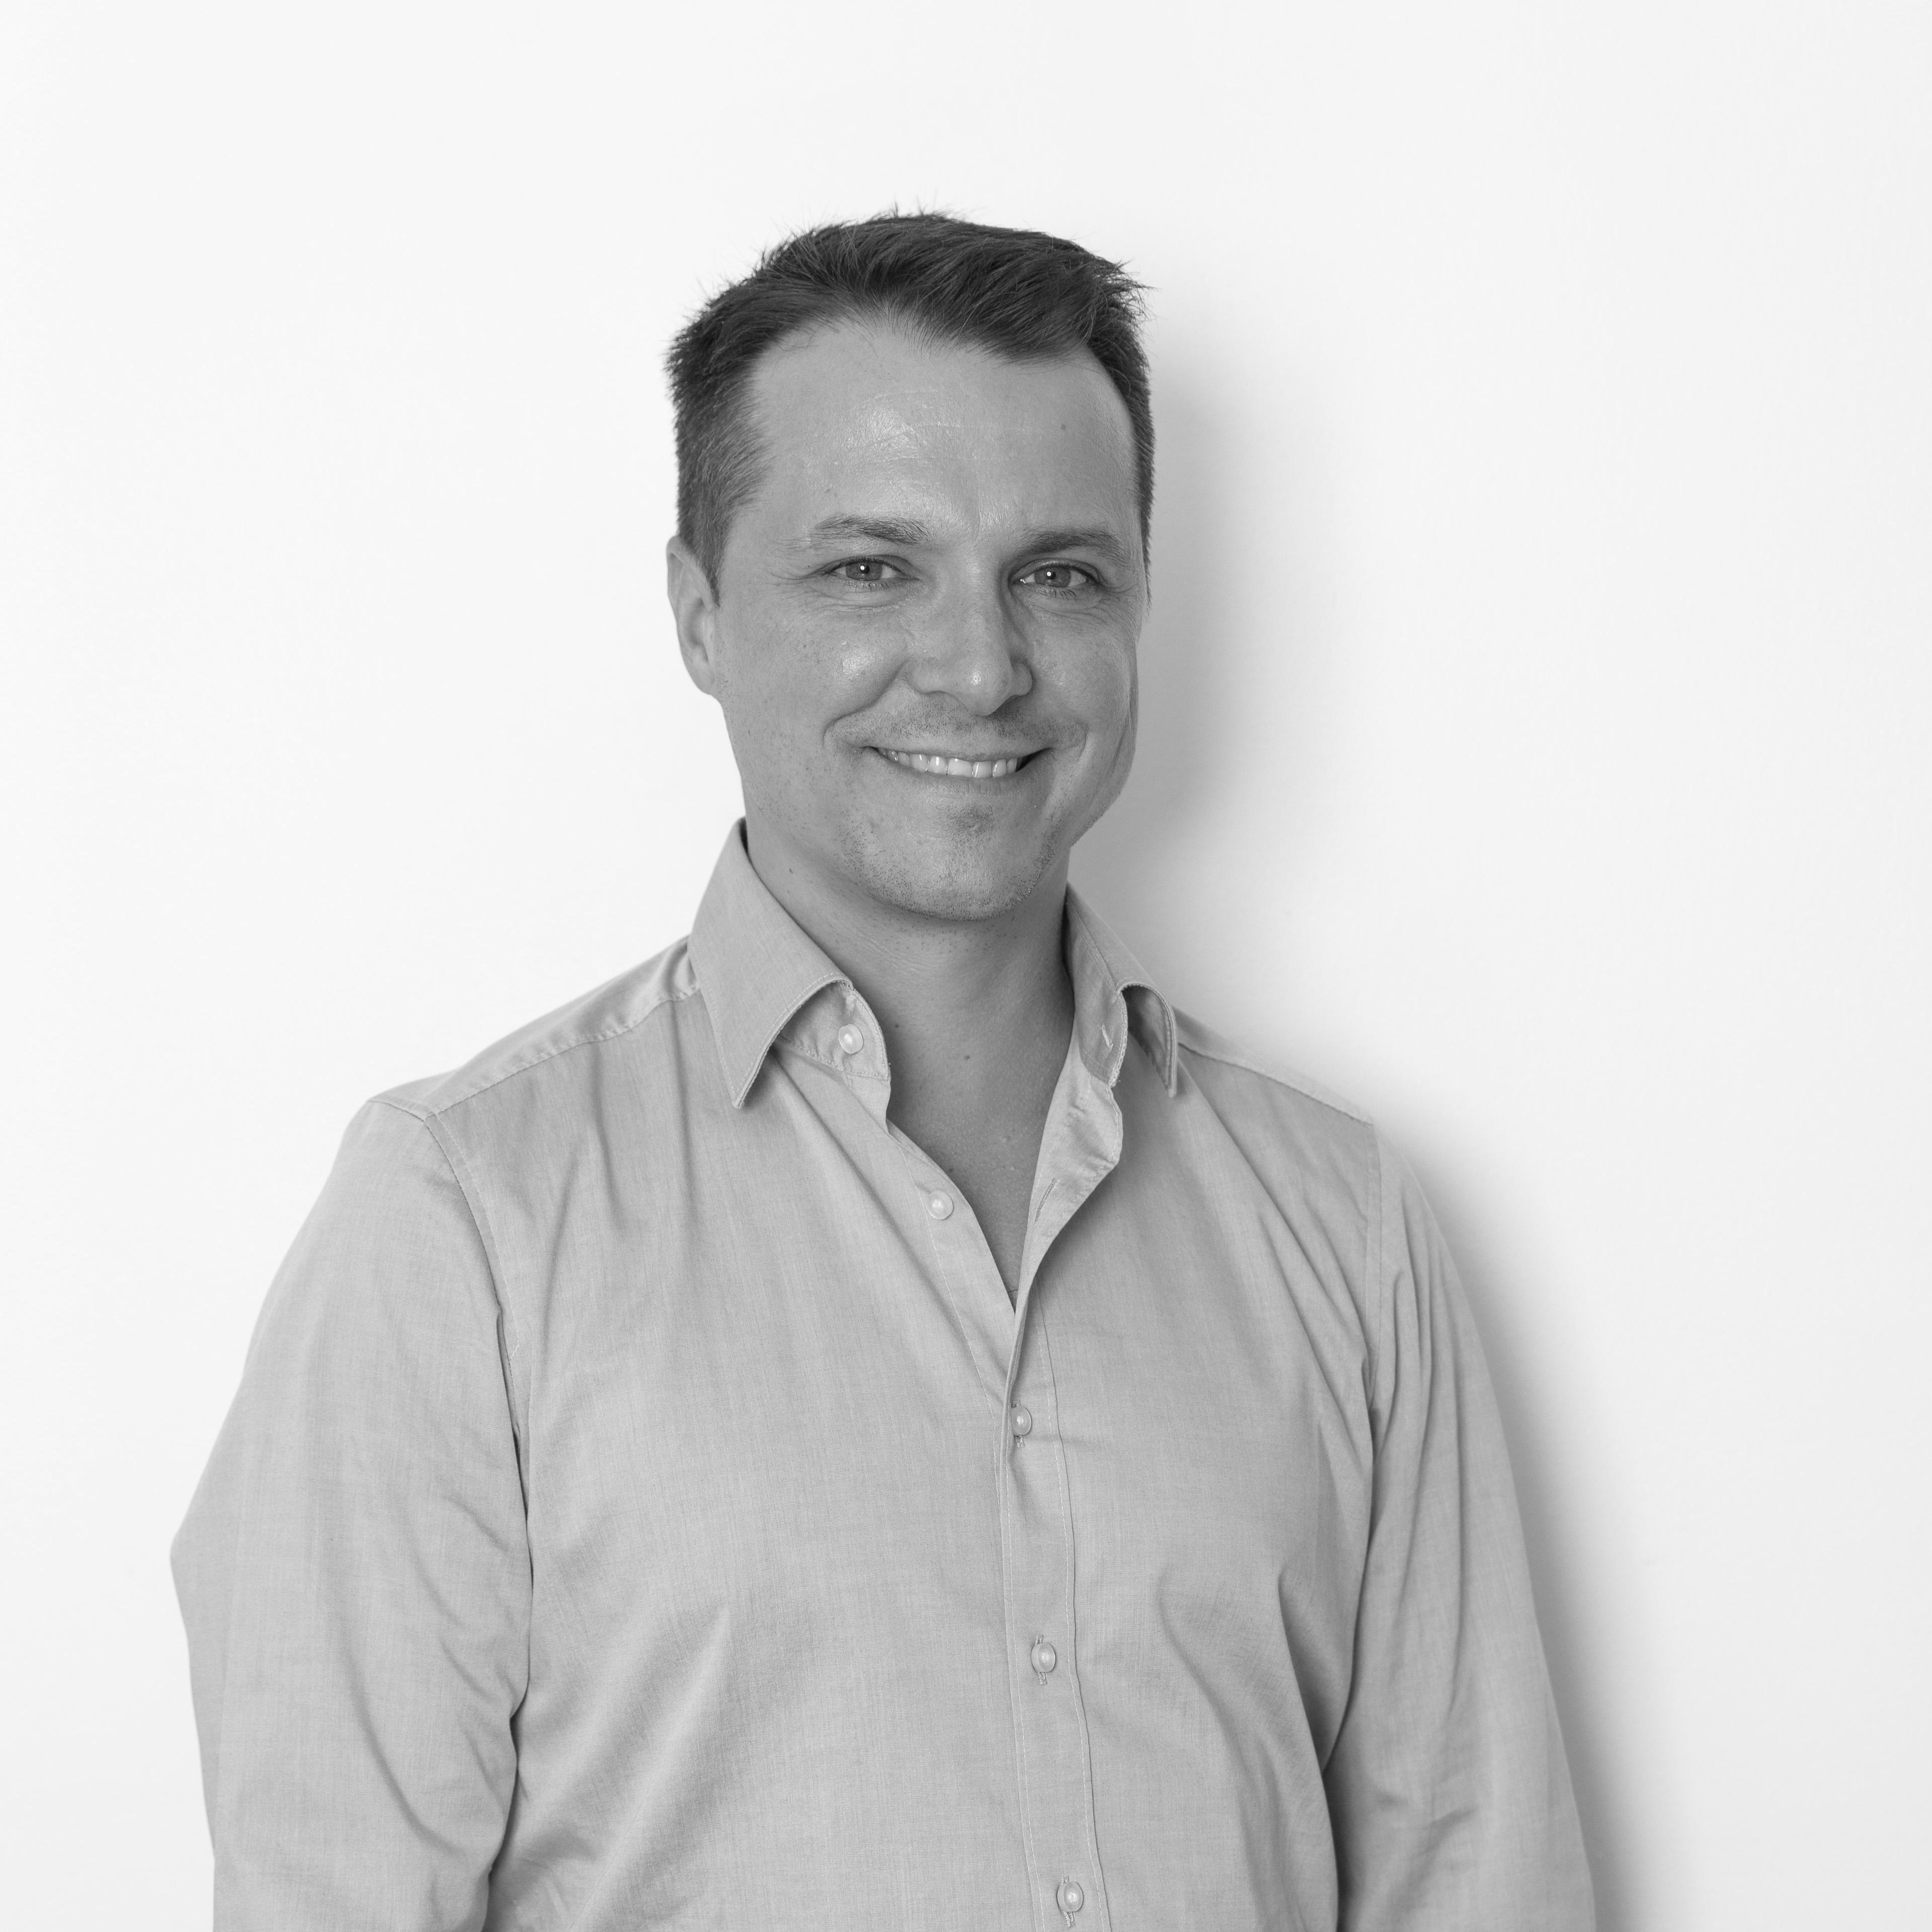 Lars Klotz